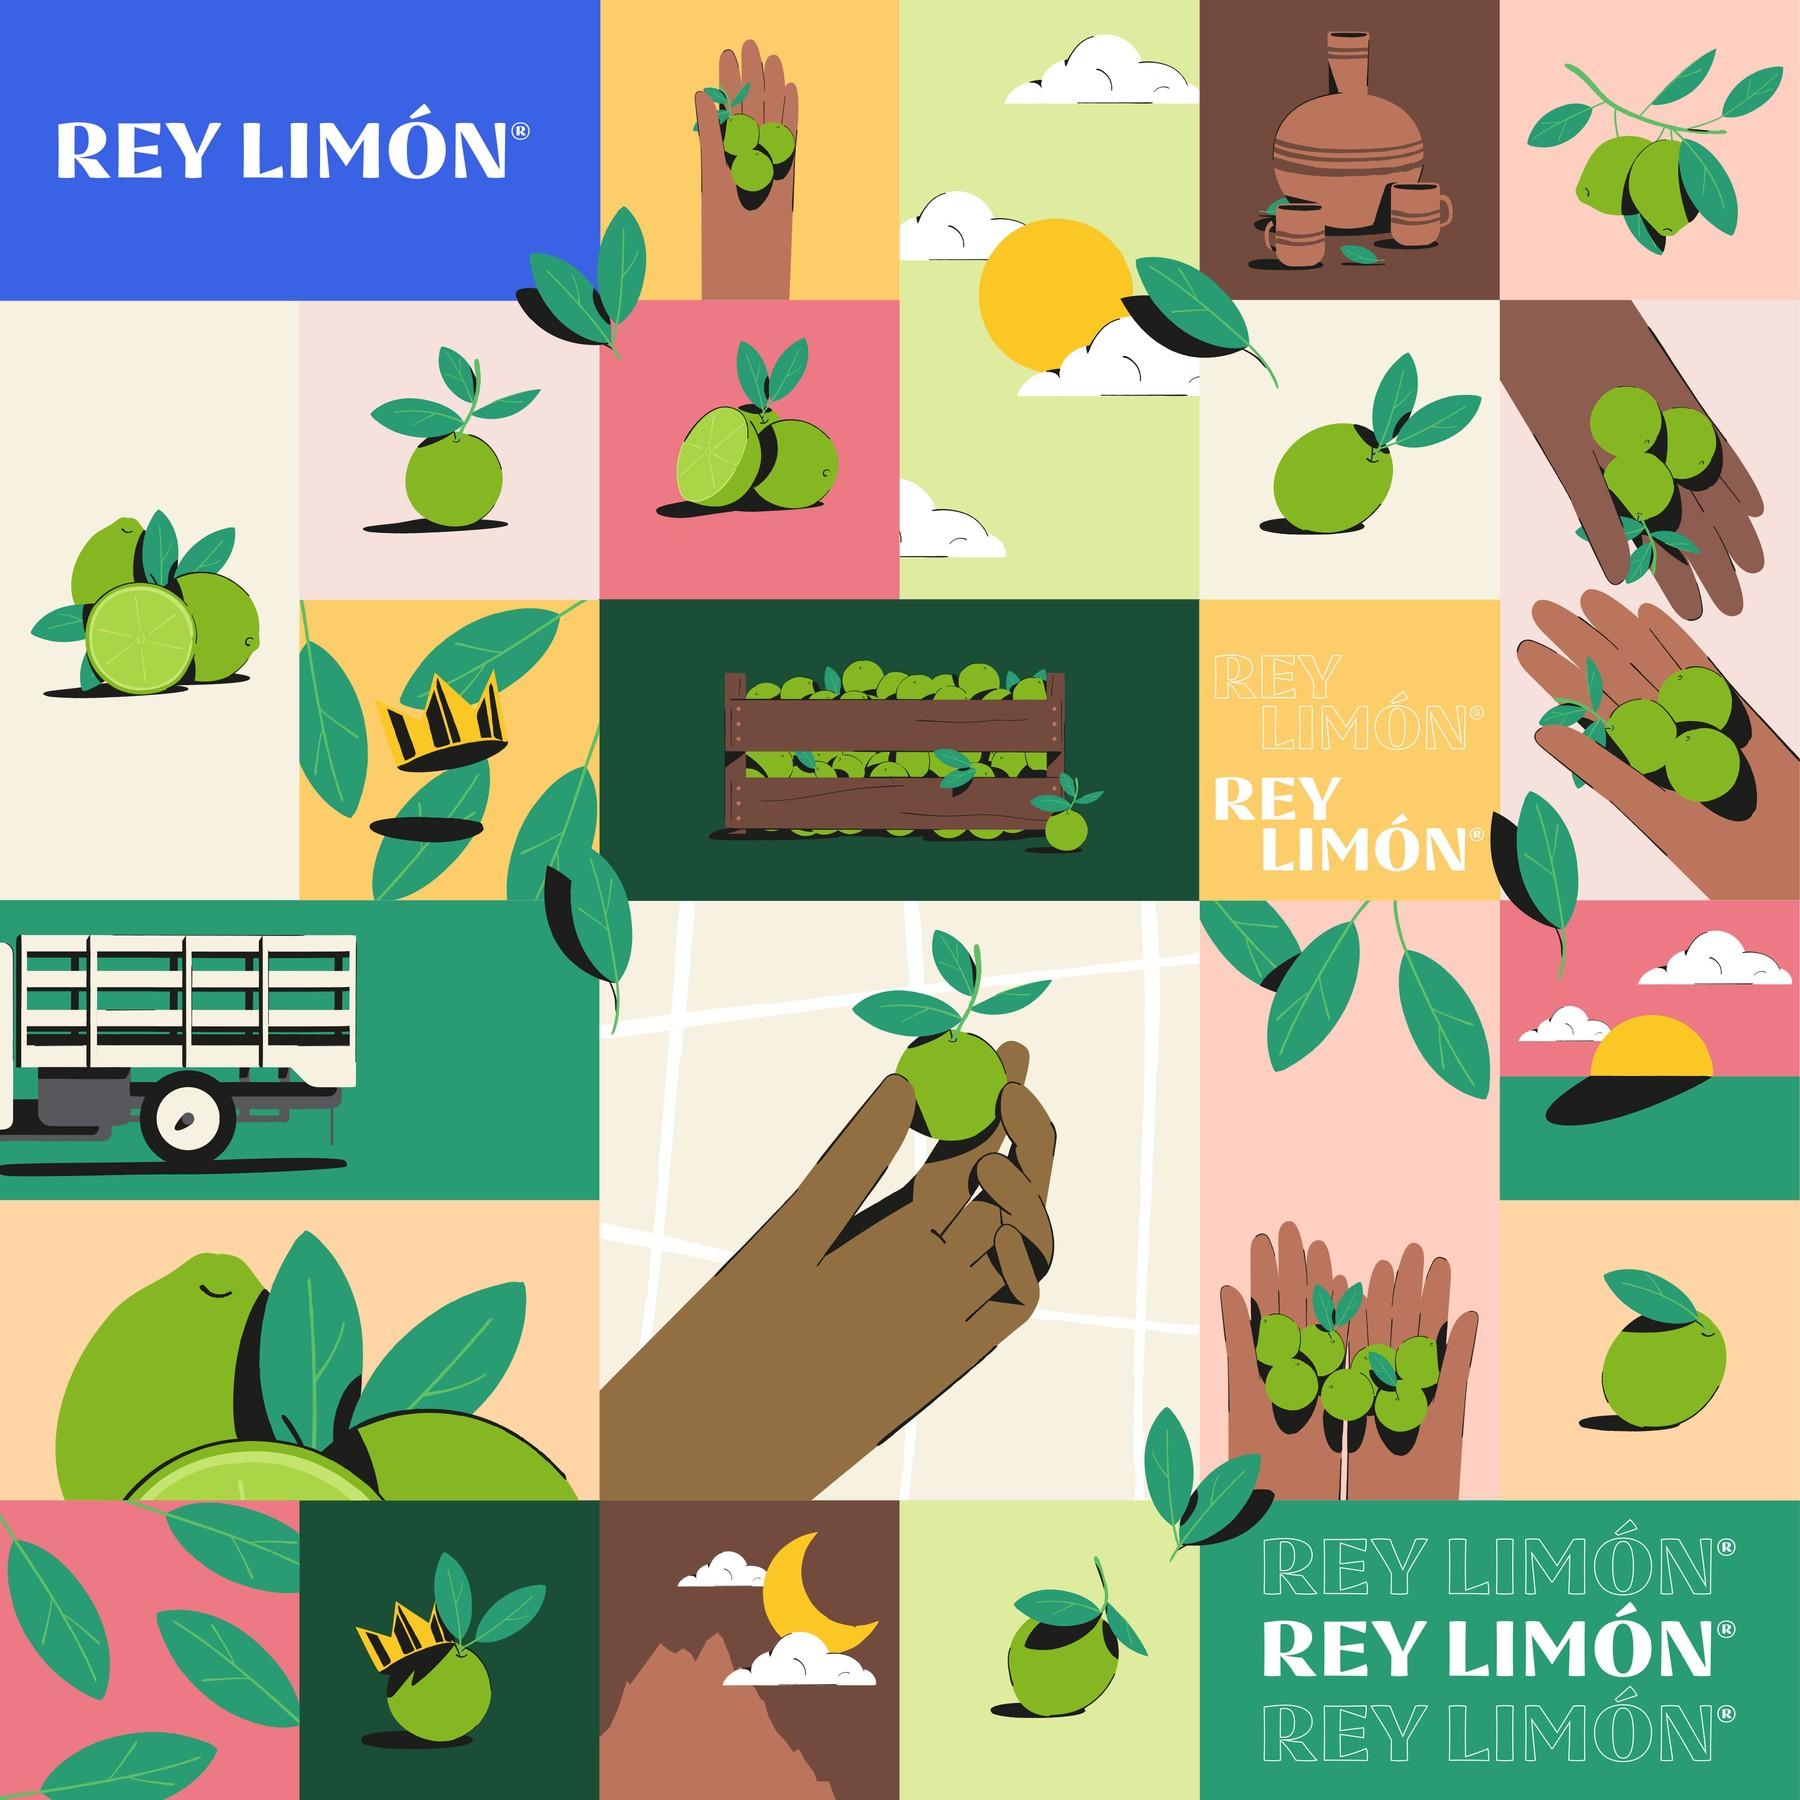 rey-limon-016.jpg